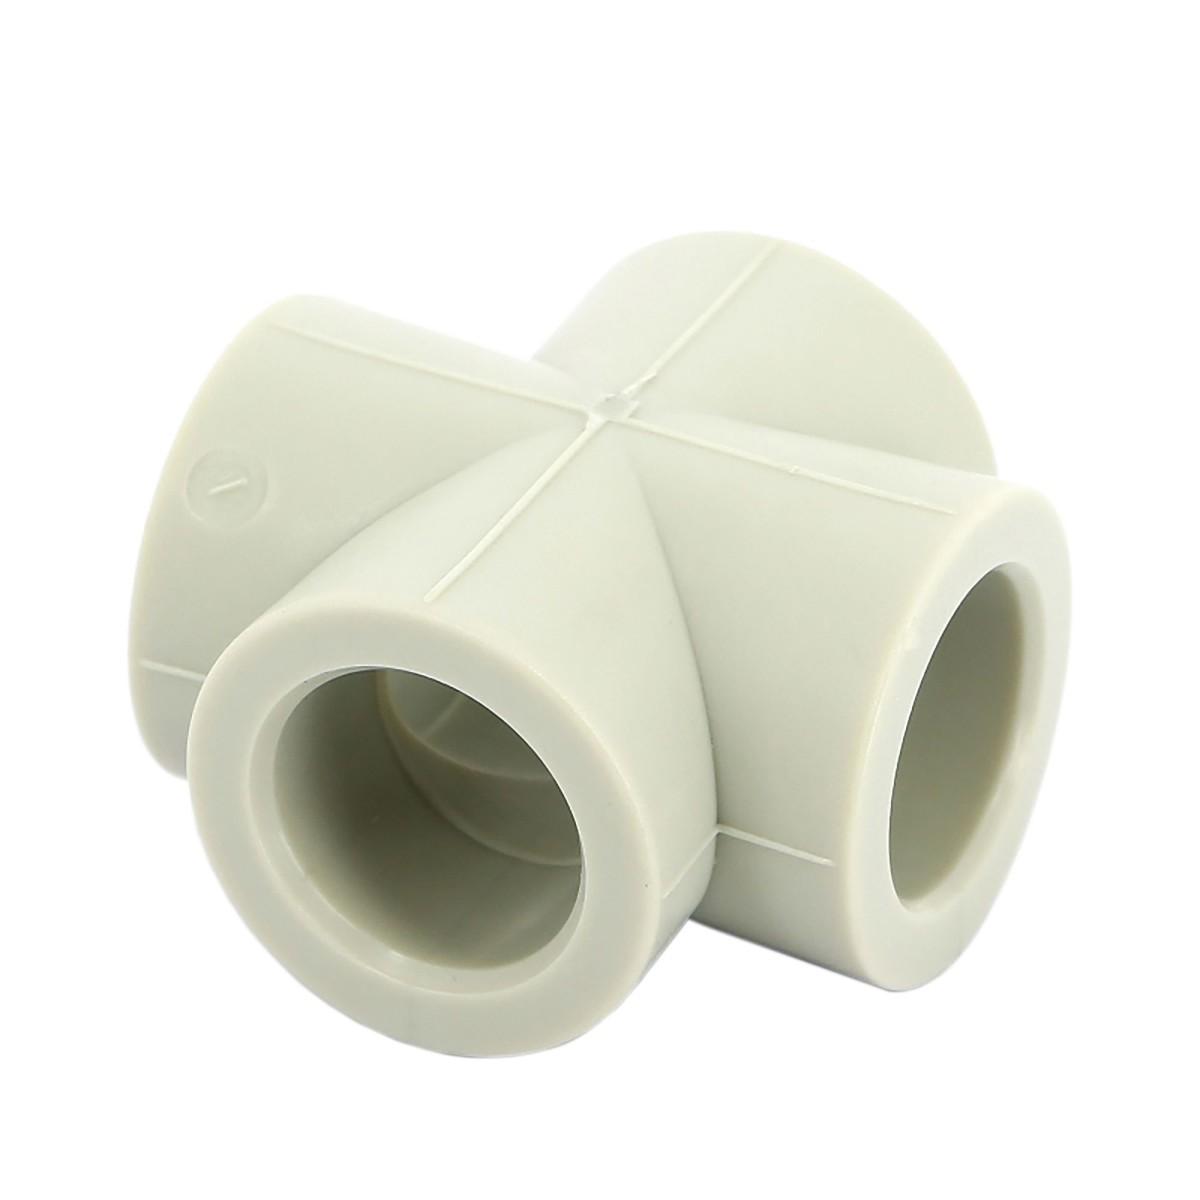 Крестовина ⌀25 Fv-Plast Полипропилен